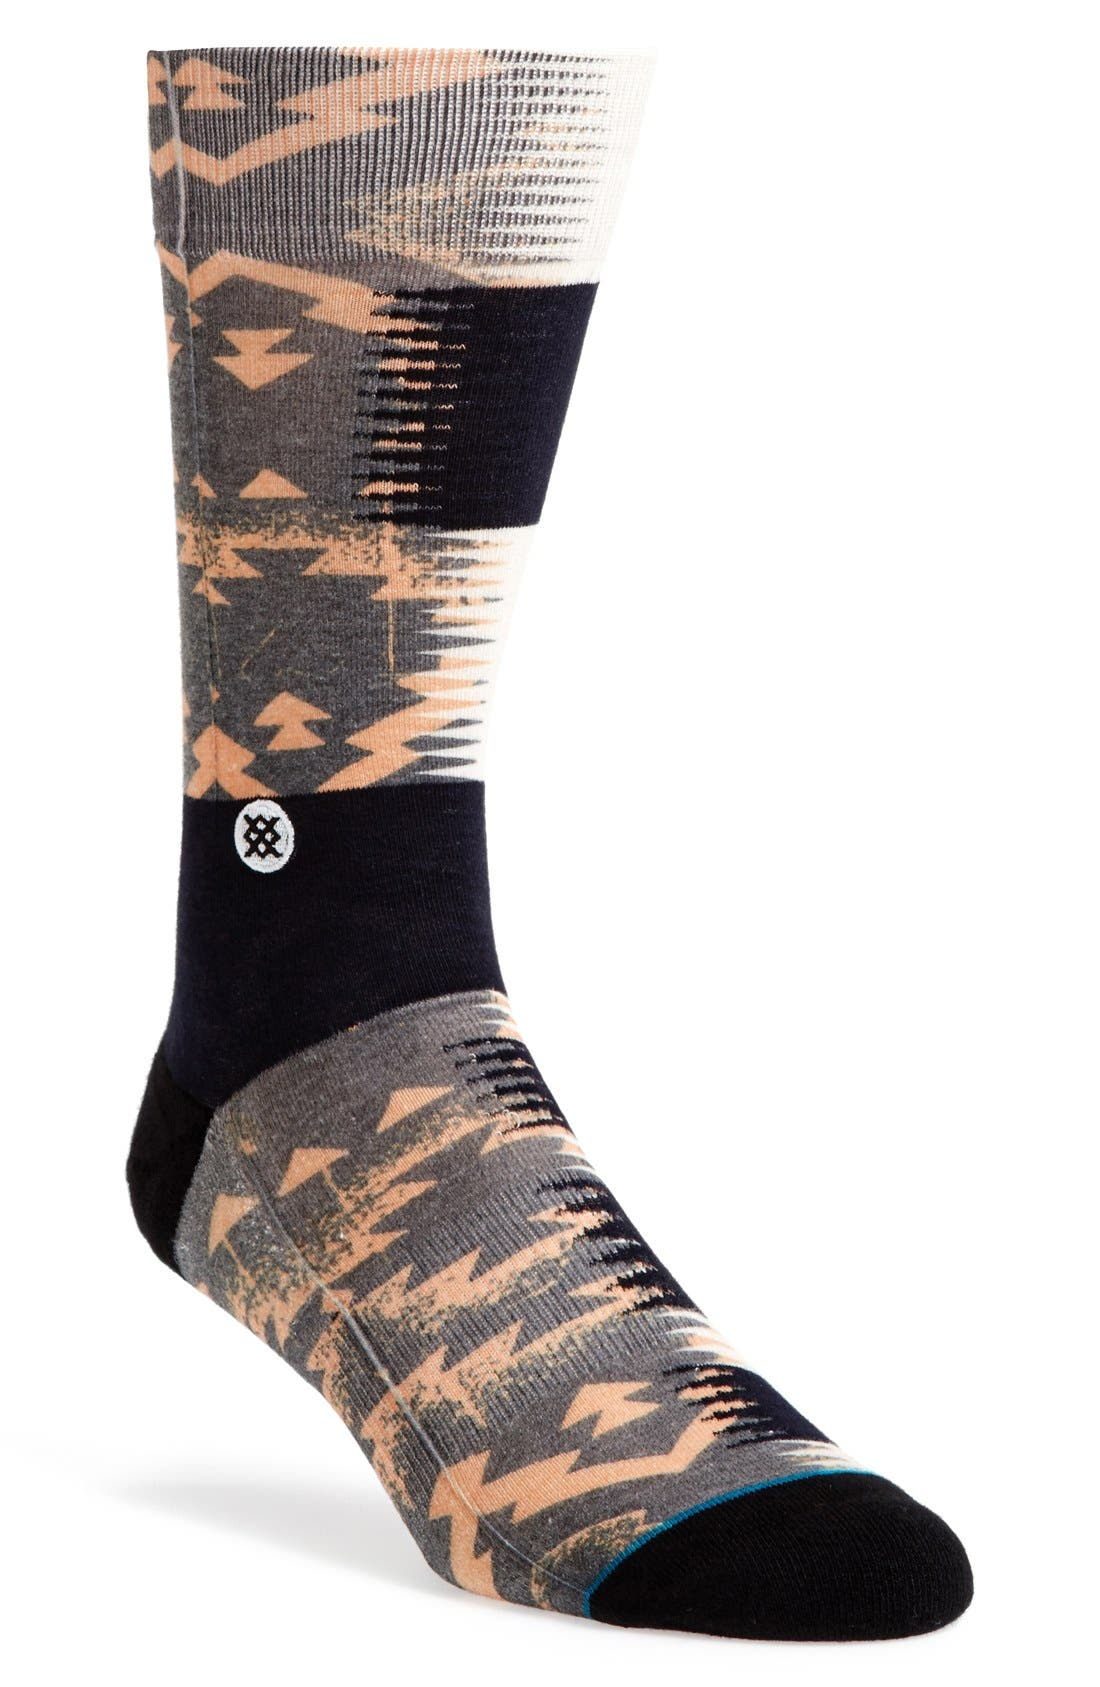 Main Image - Stance 'Maxwell' Socks